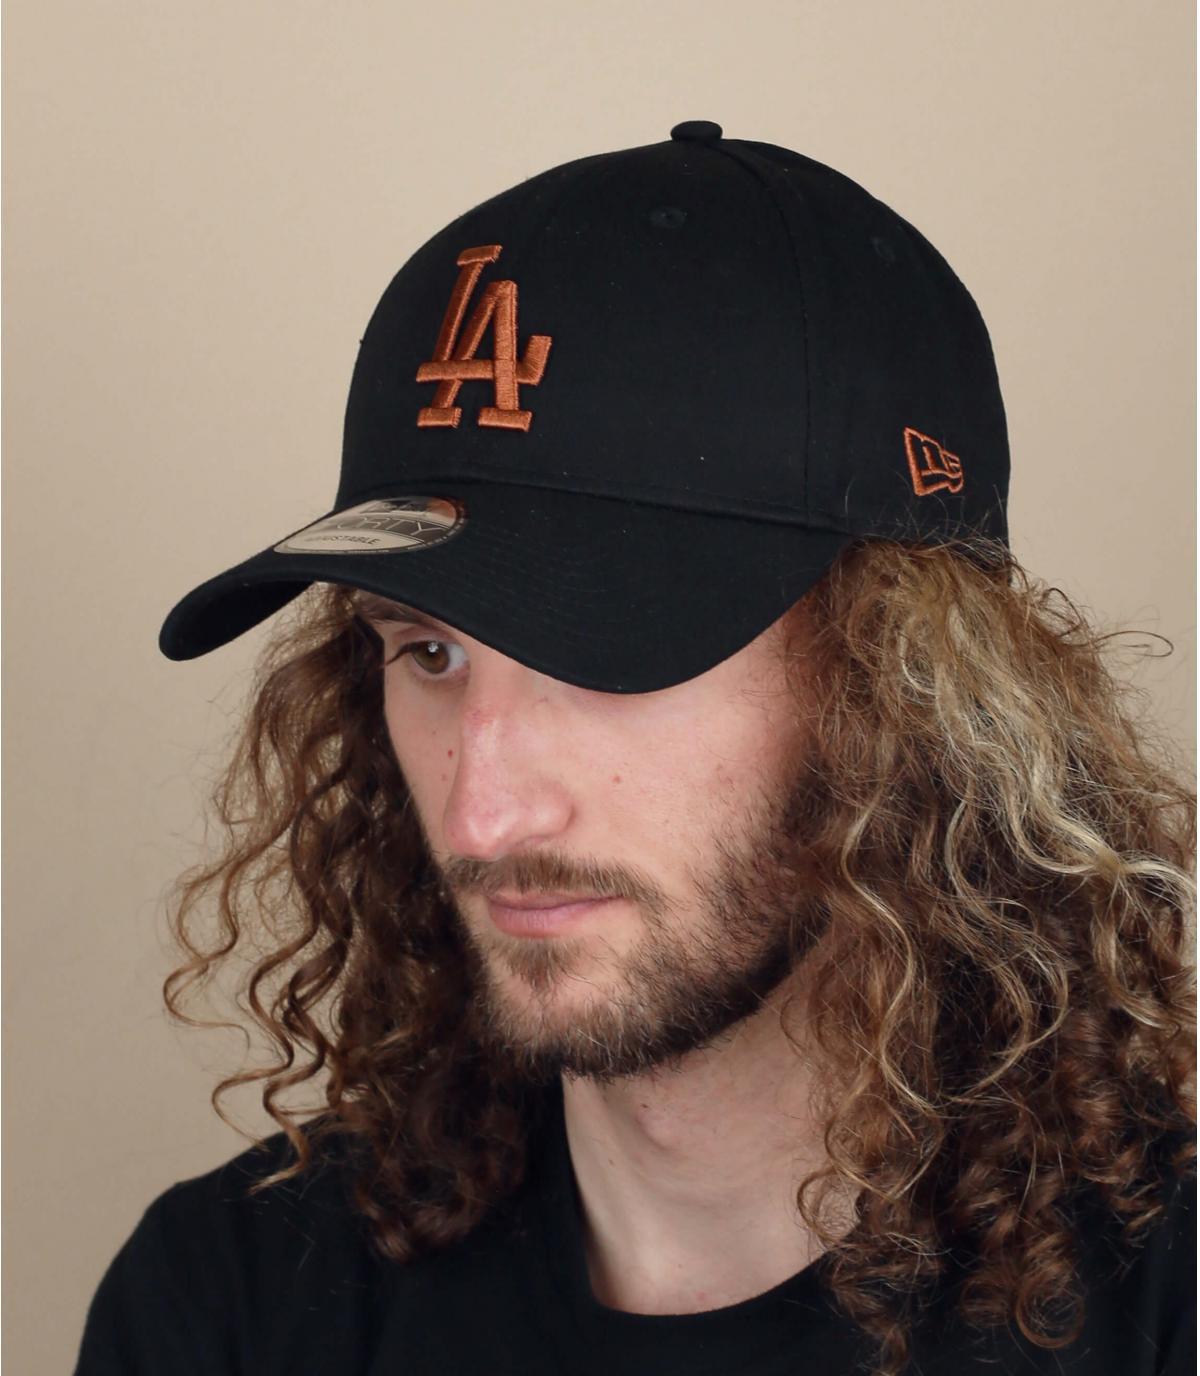 Beige black LA cap